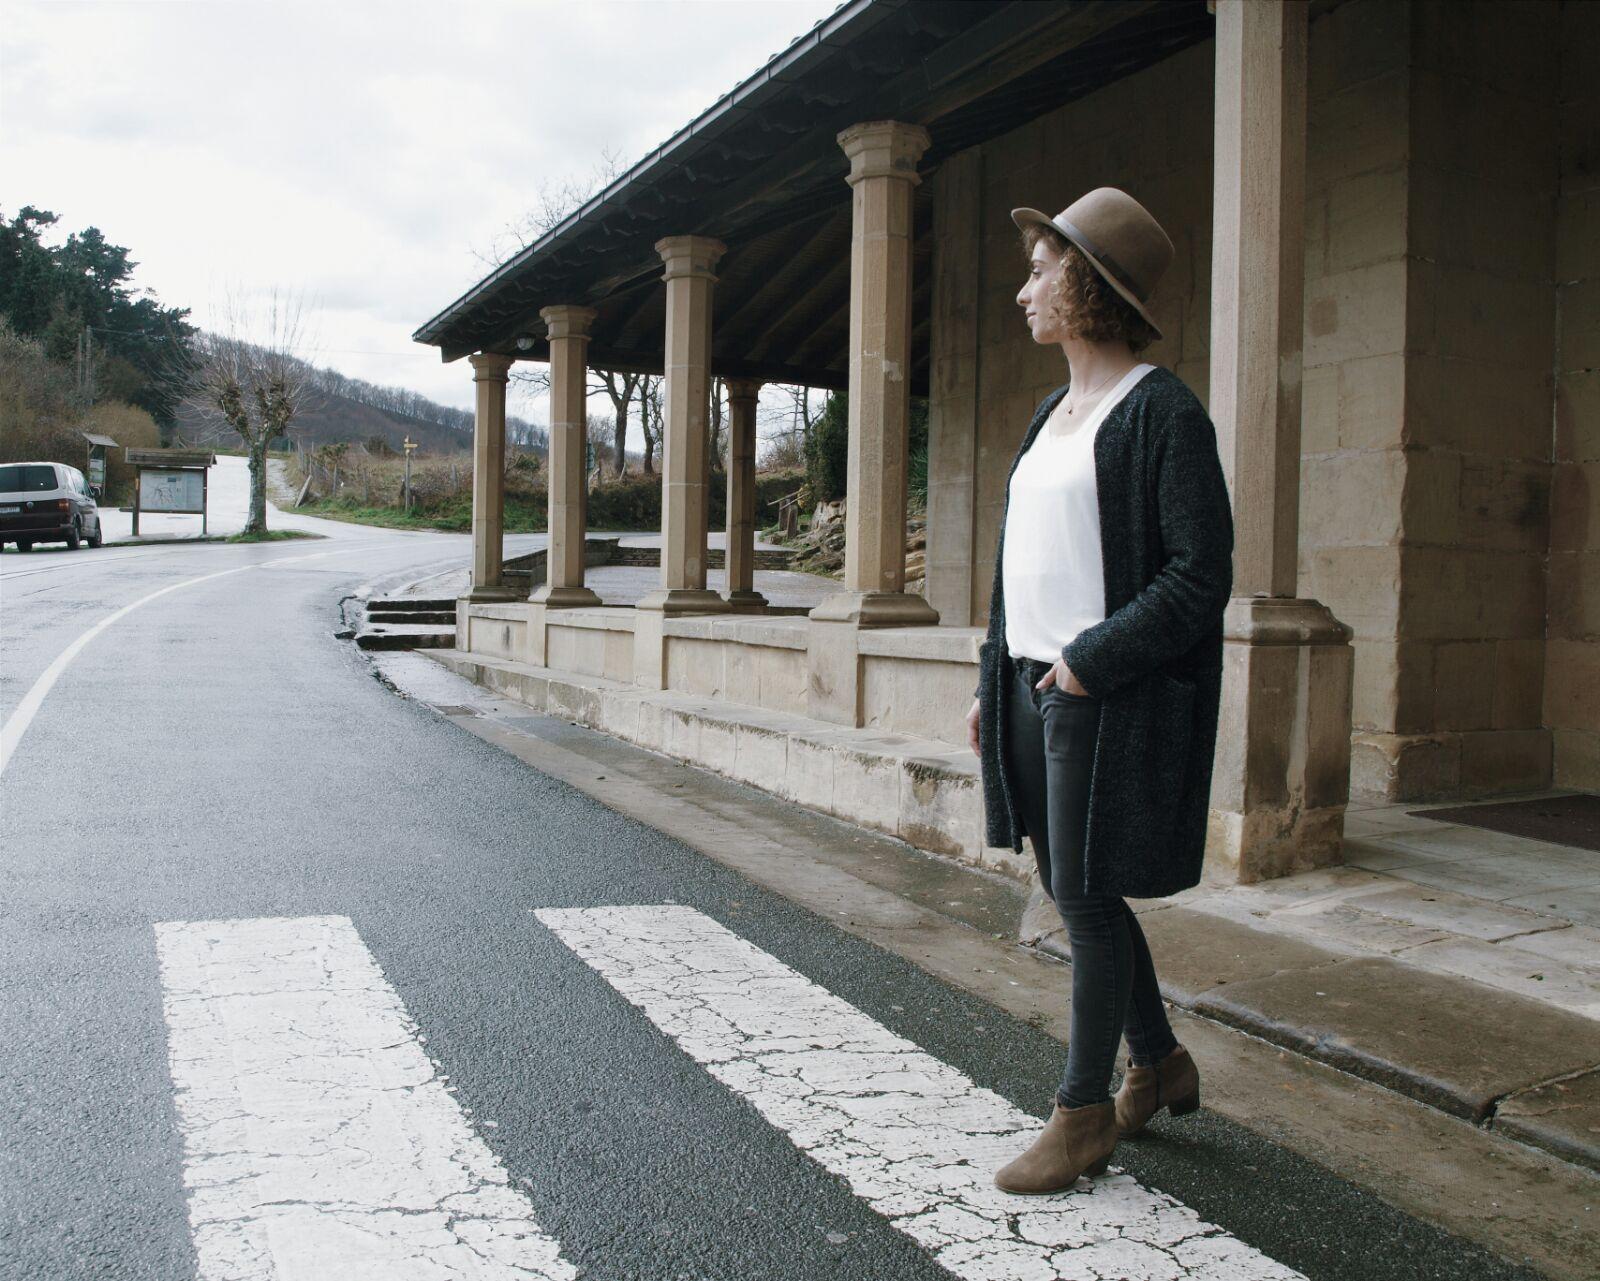 beige-tenue-outfit-look-coastalandco-hendaye-blog-blogger-boots-bottines-destroy-jeans-hat-necklace-woman-cachecache